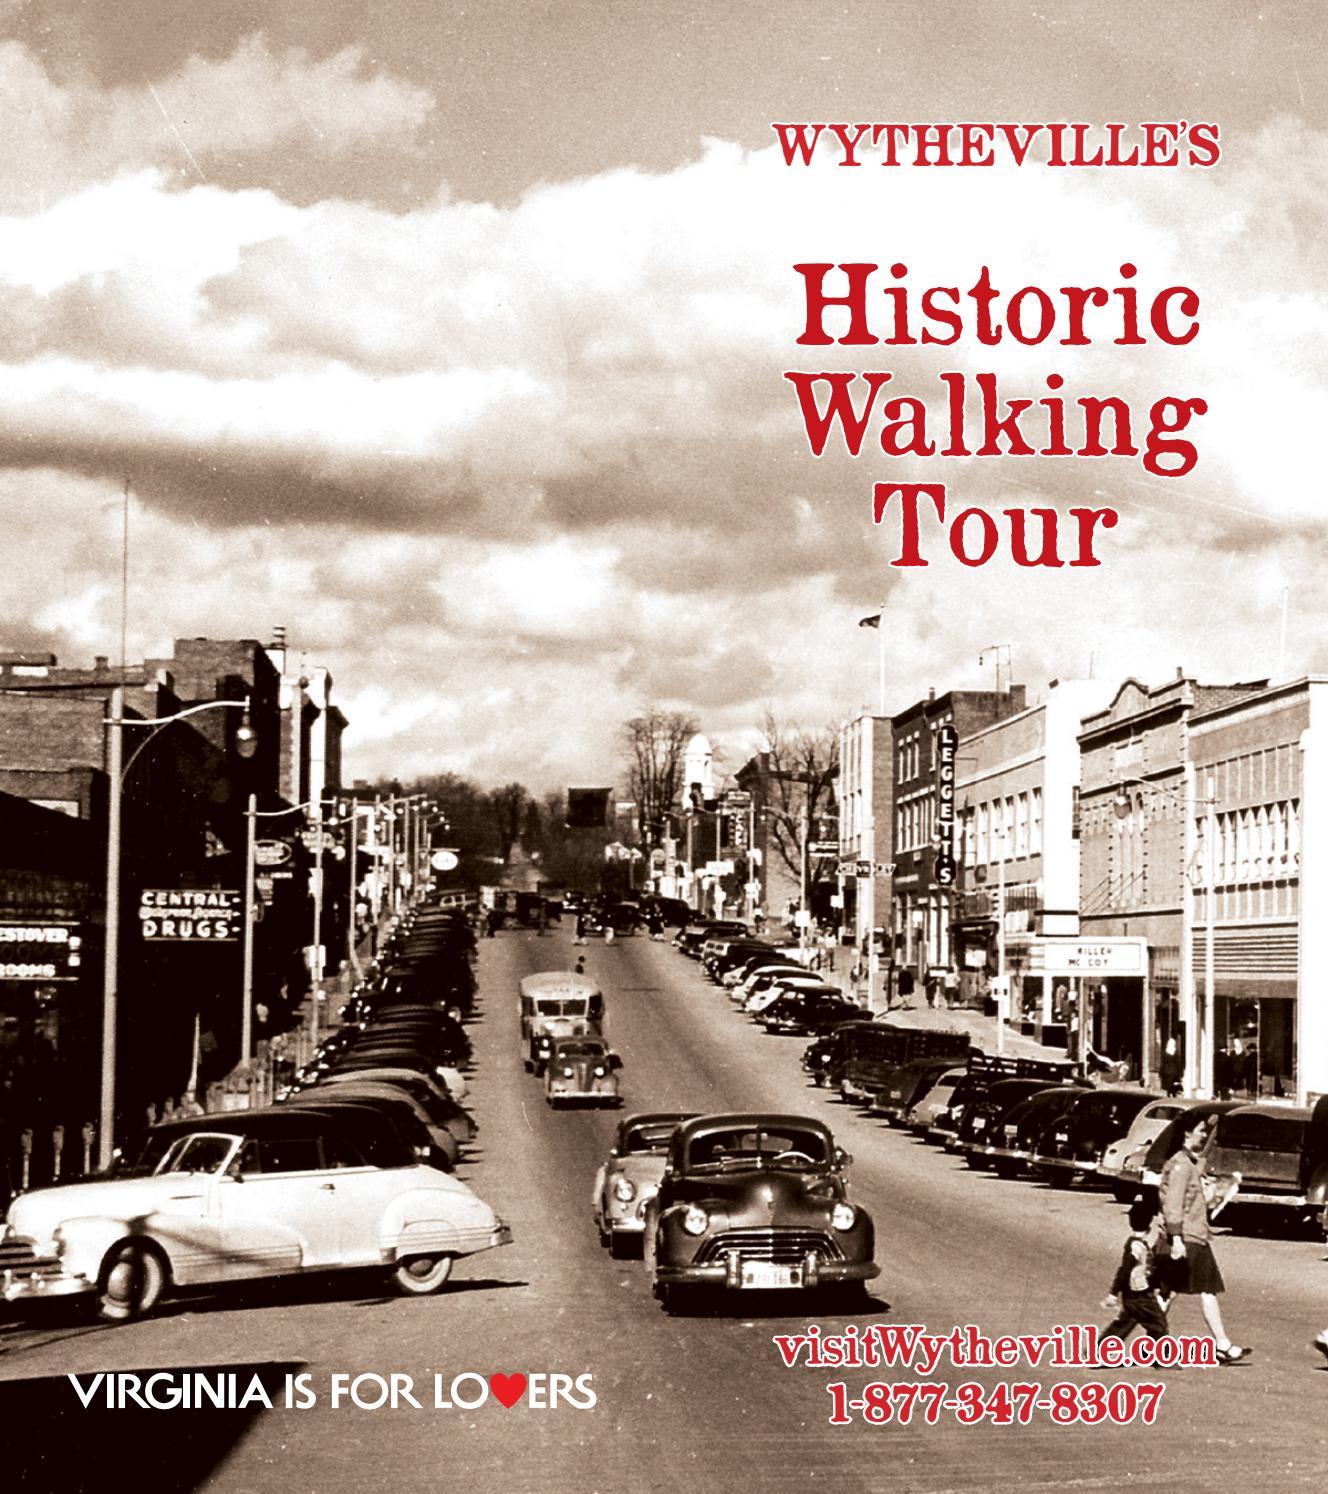 Wytheville's Historic Walking Tour by Stallard Studios Publishing